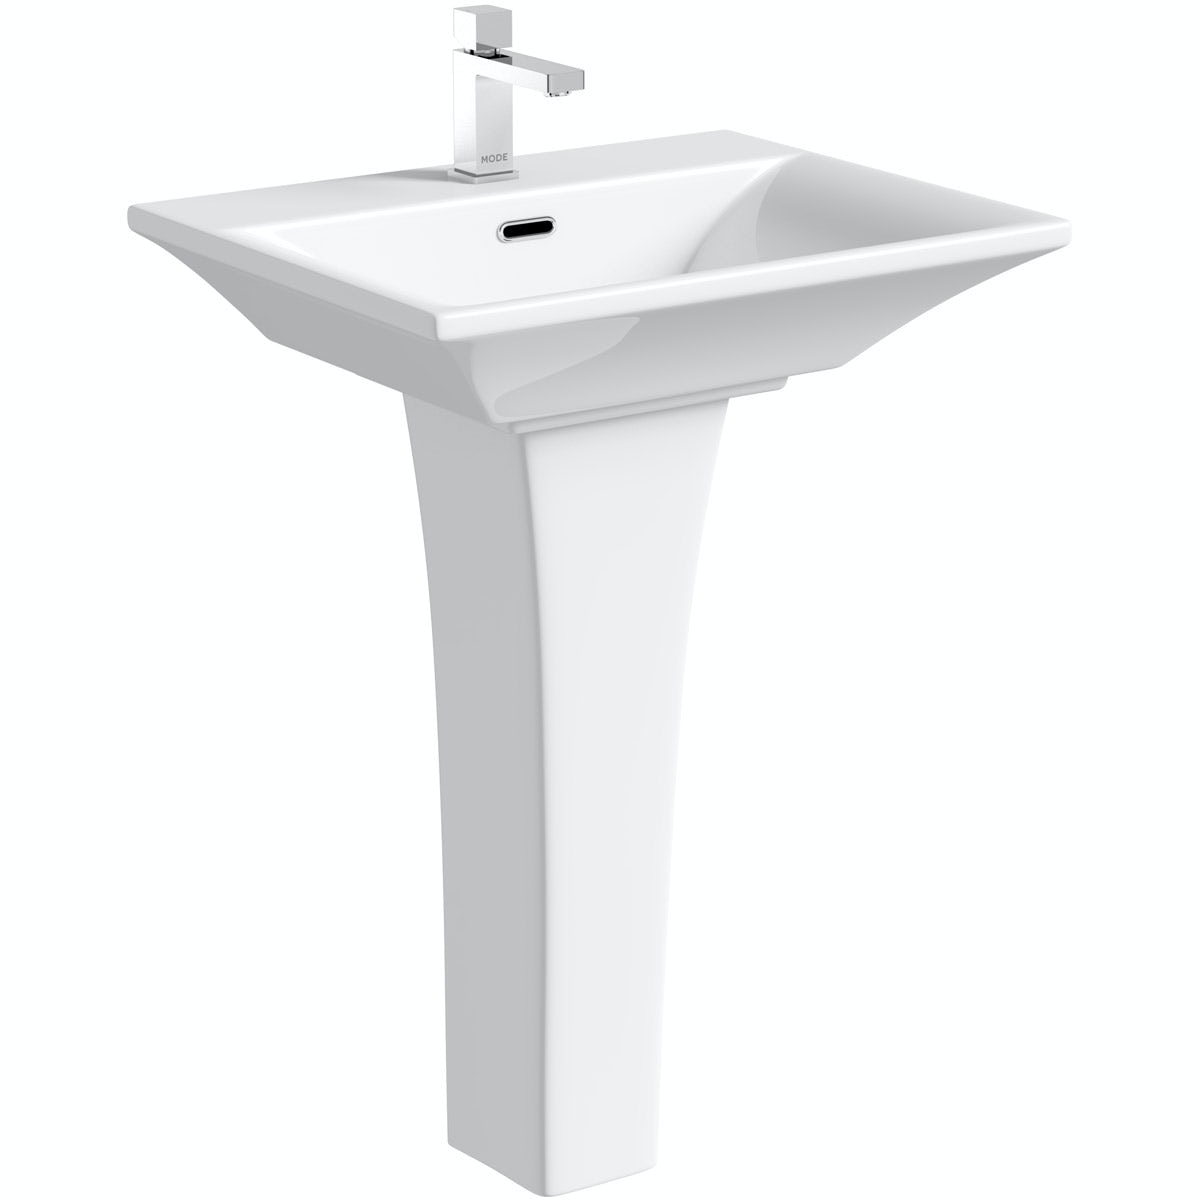 Mode Austin 1 tap hole full pedestal basin 605mm